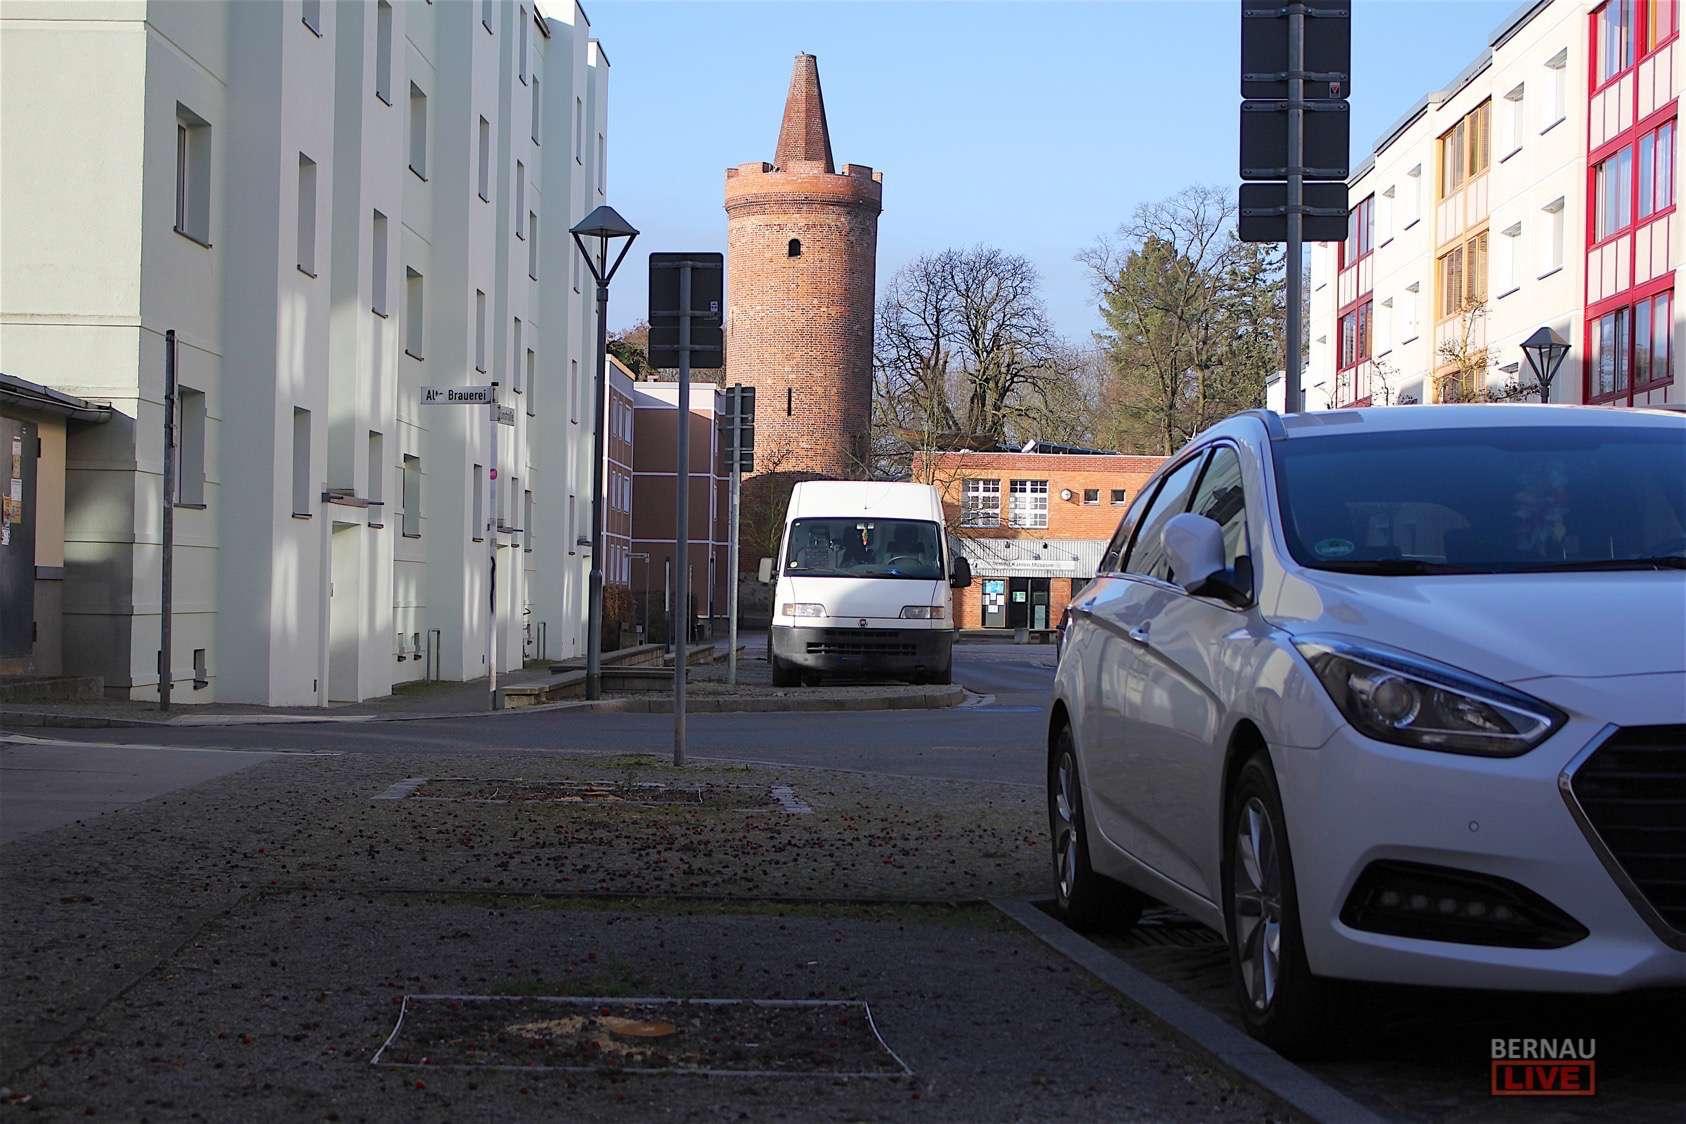 Bernau: Linde an der St.-Marien-Kirche musste gefällt werden